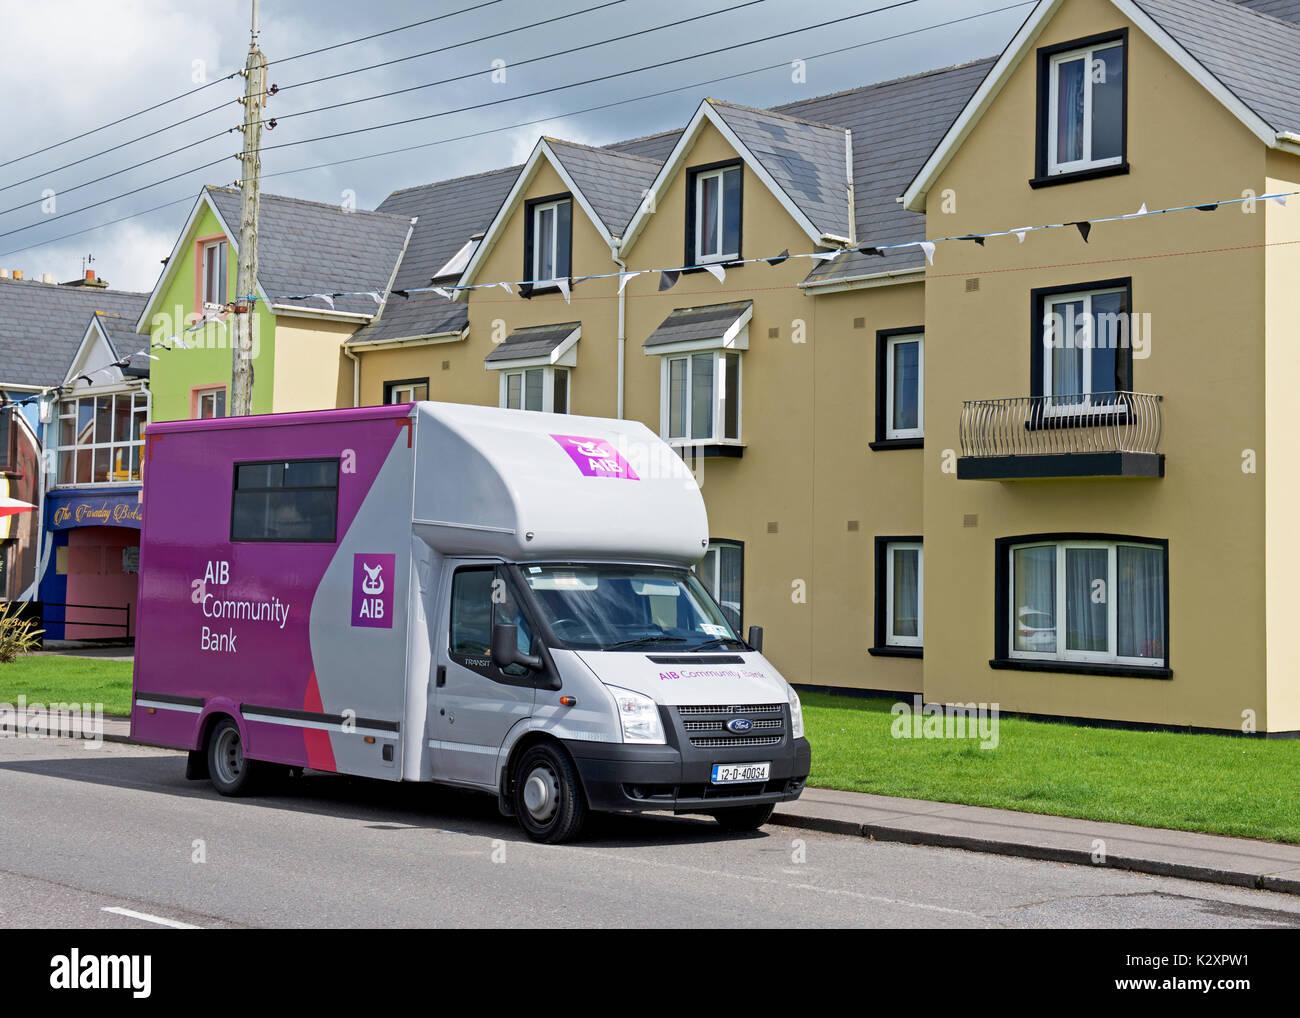 AIB mobile bank, Southern Ireland - Stock Image